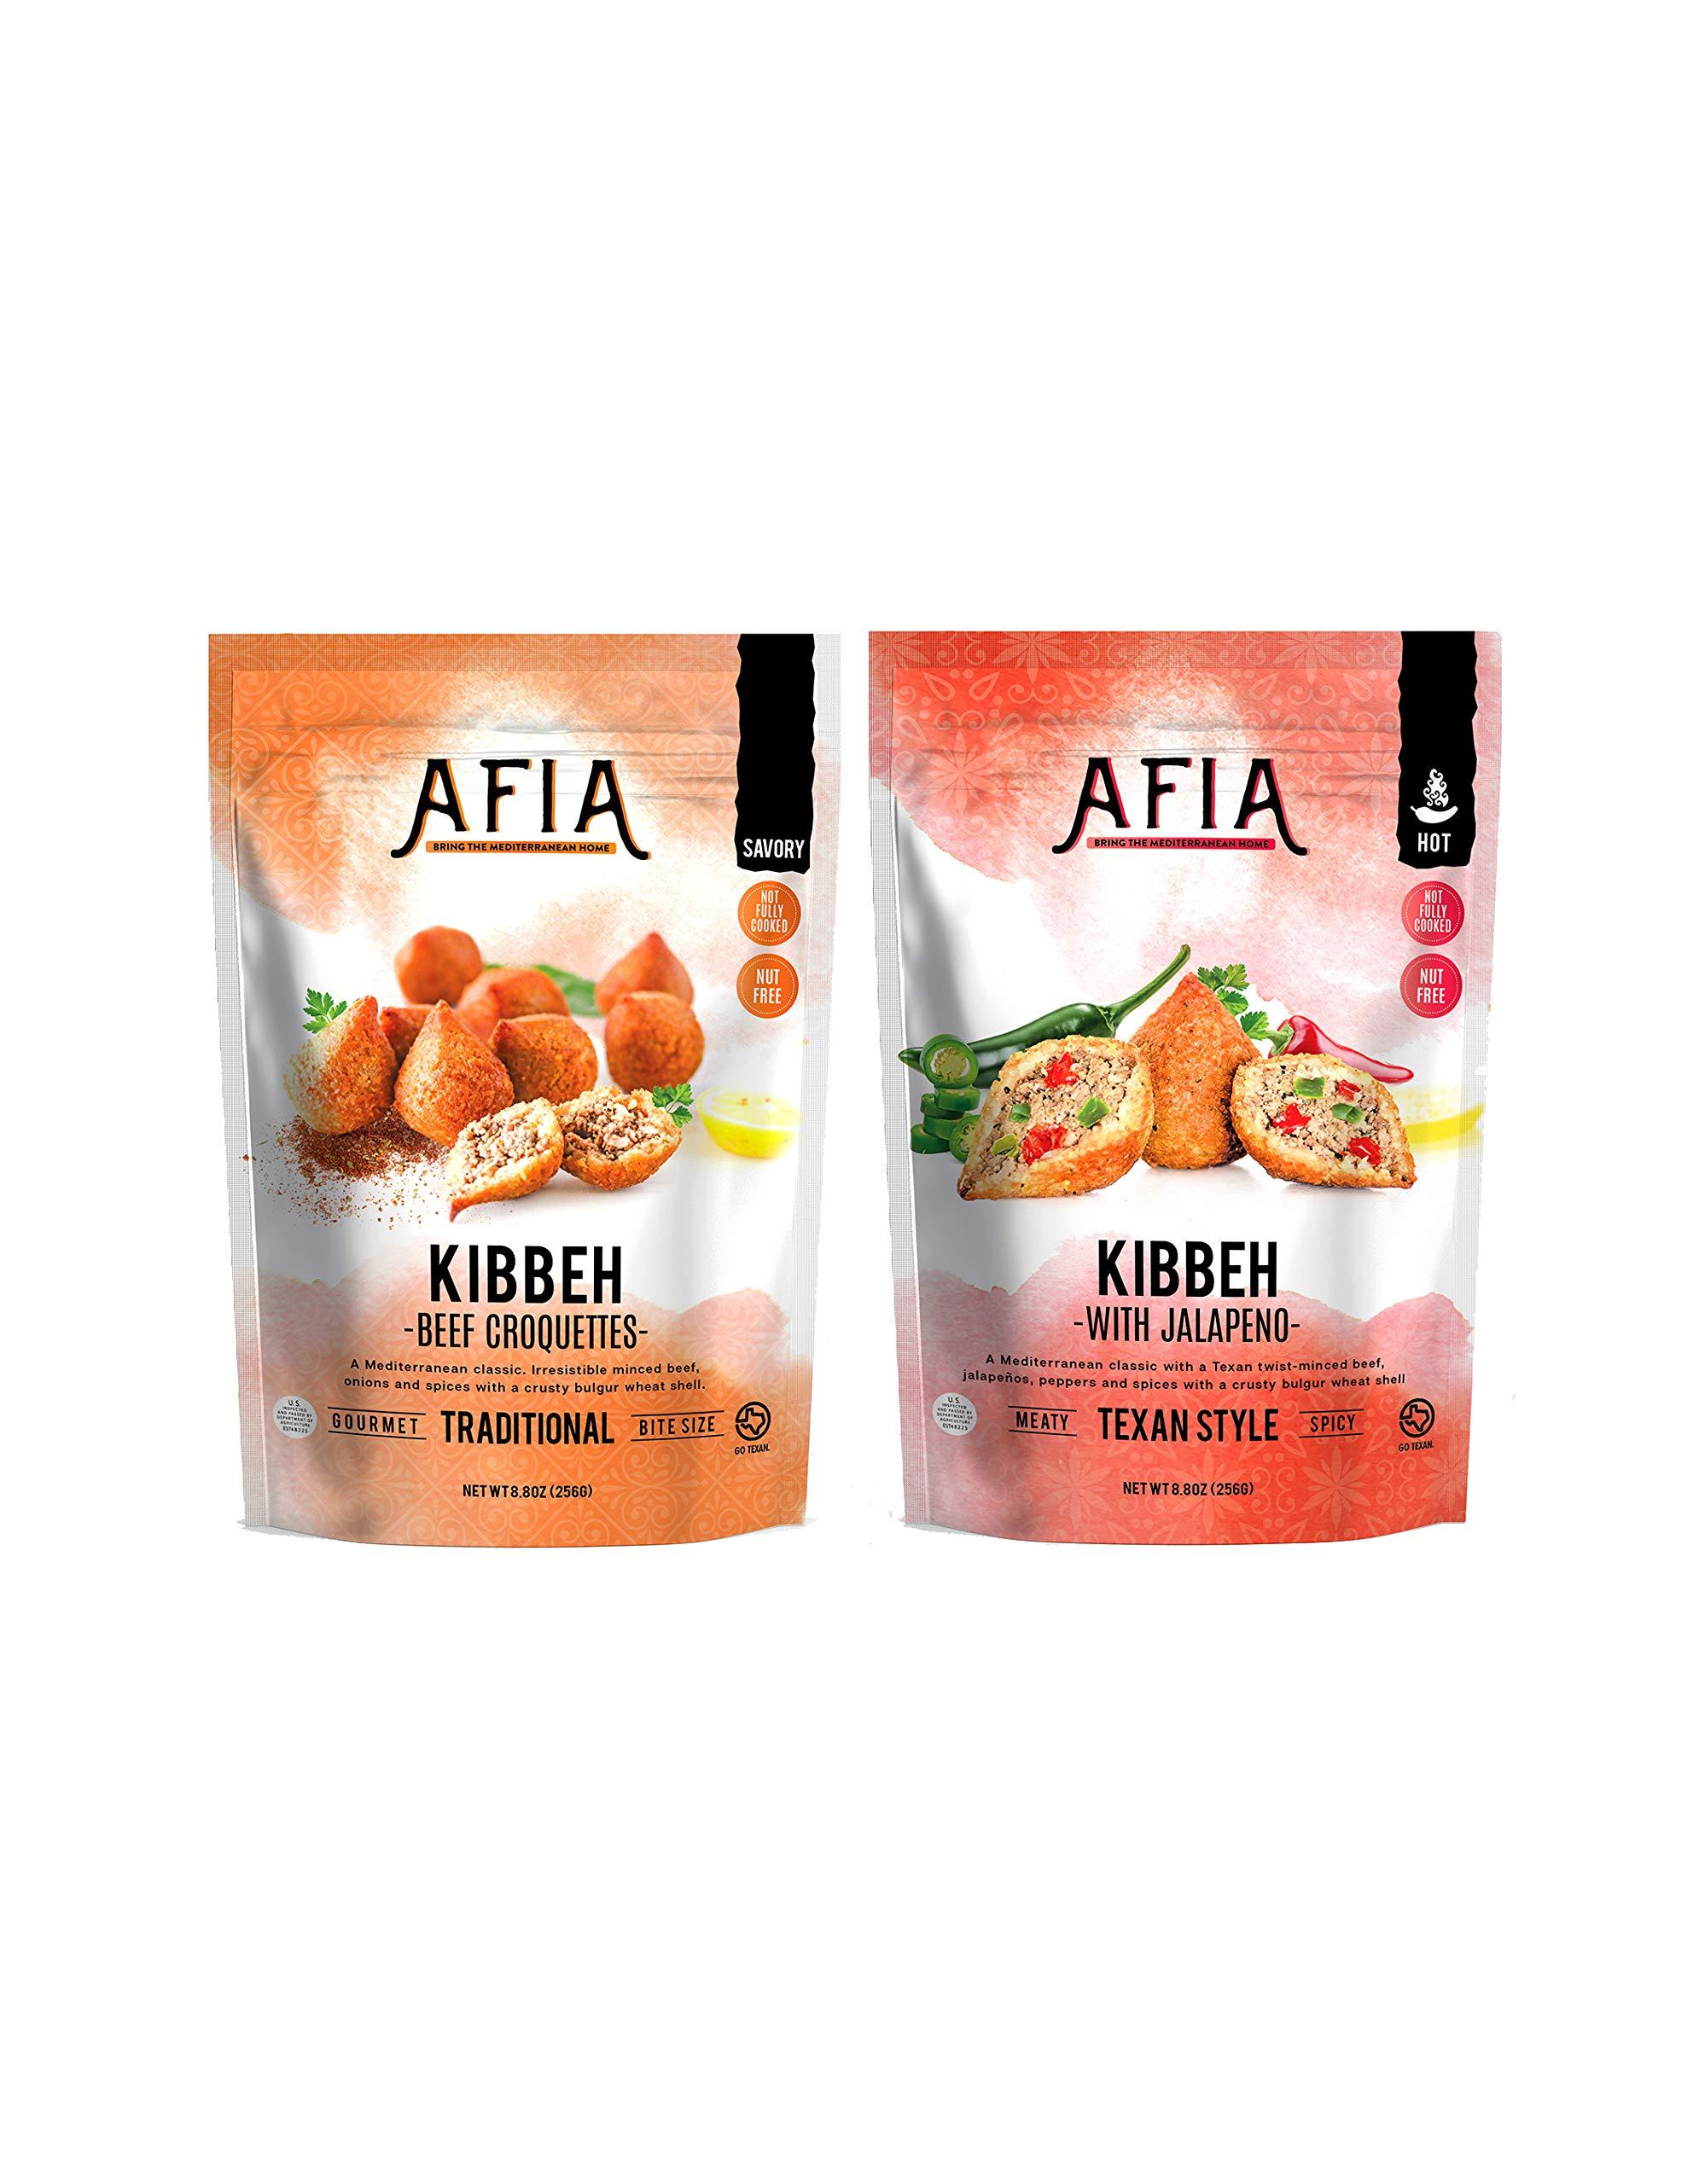 Frozen Original Kibbeh & Spicy Jalapeno Kibbeh Bundle - Pack of (10) bags - (approx 80 count) - Just Heat & Eat!